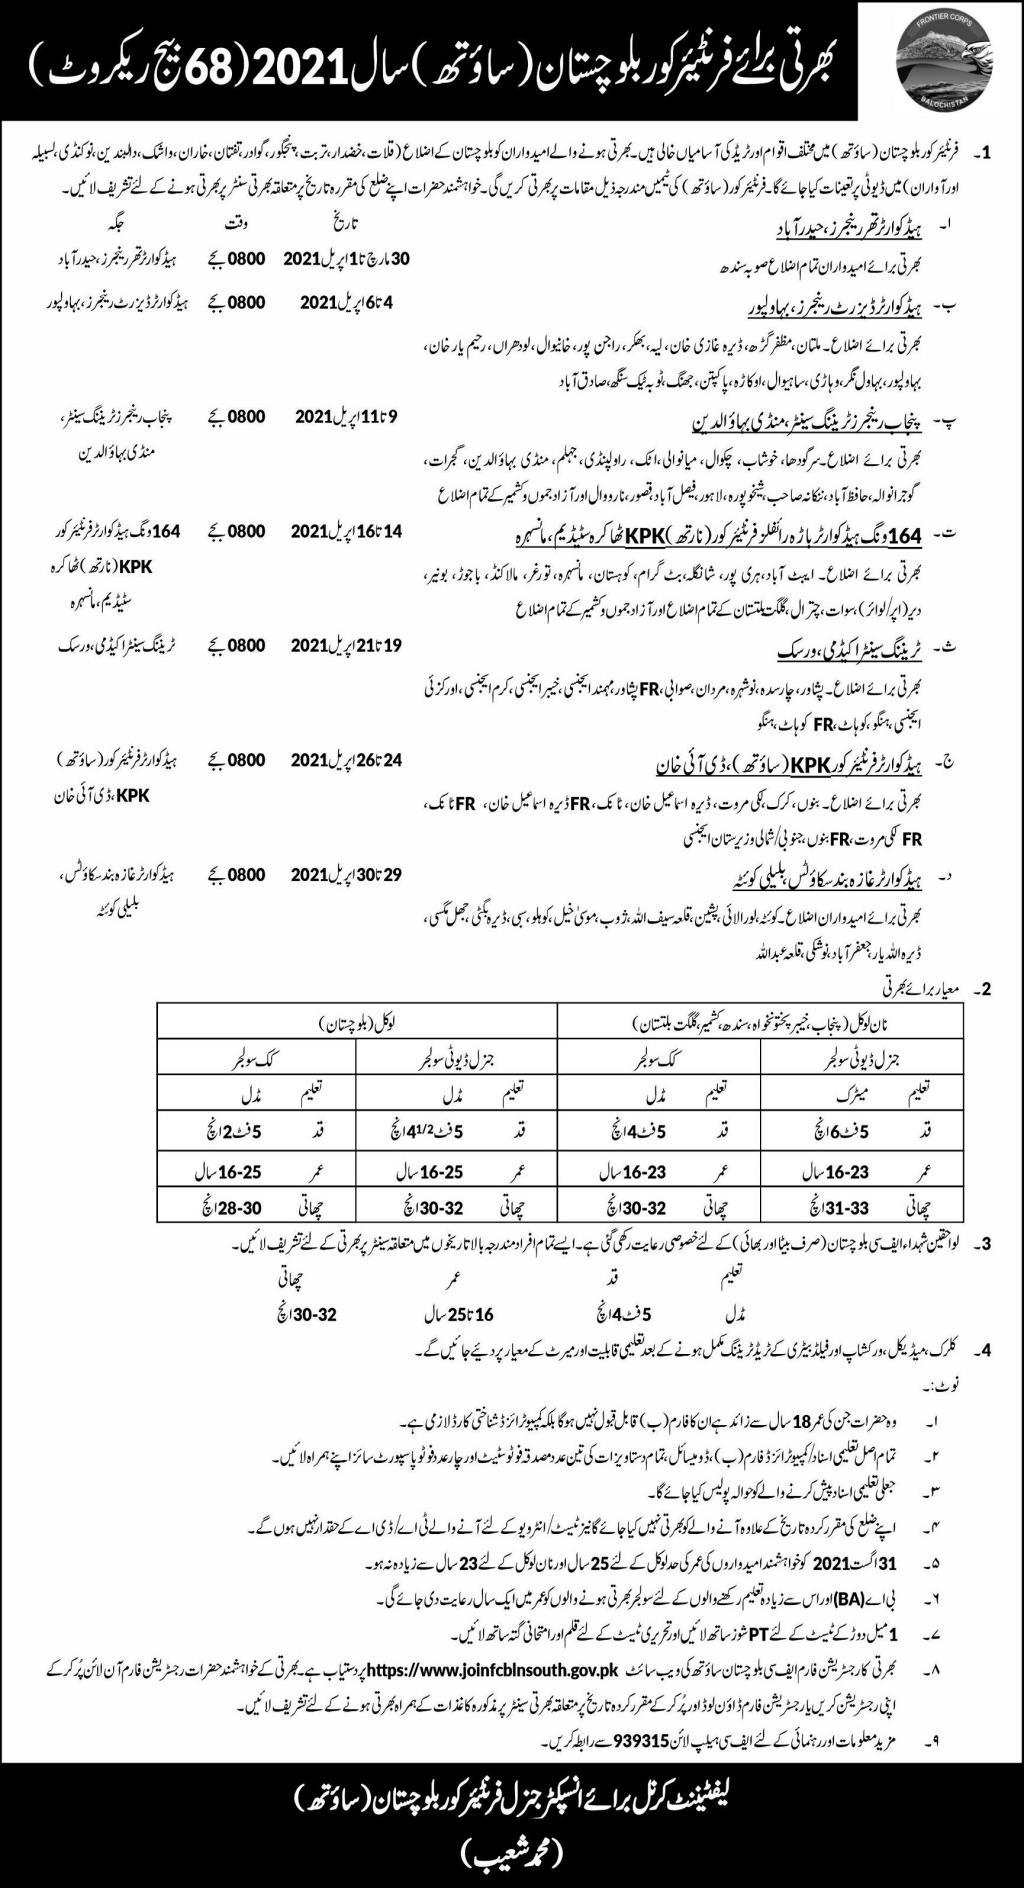 Frontier Core Balochistan FCB South 68 Batch Recruitment Jobs 2021 | Online Application Form Sindh